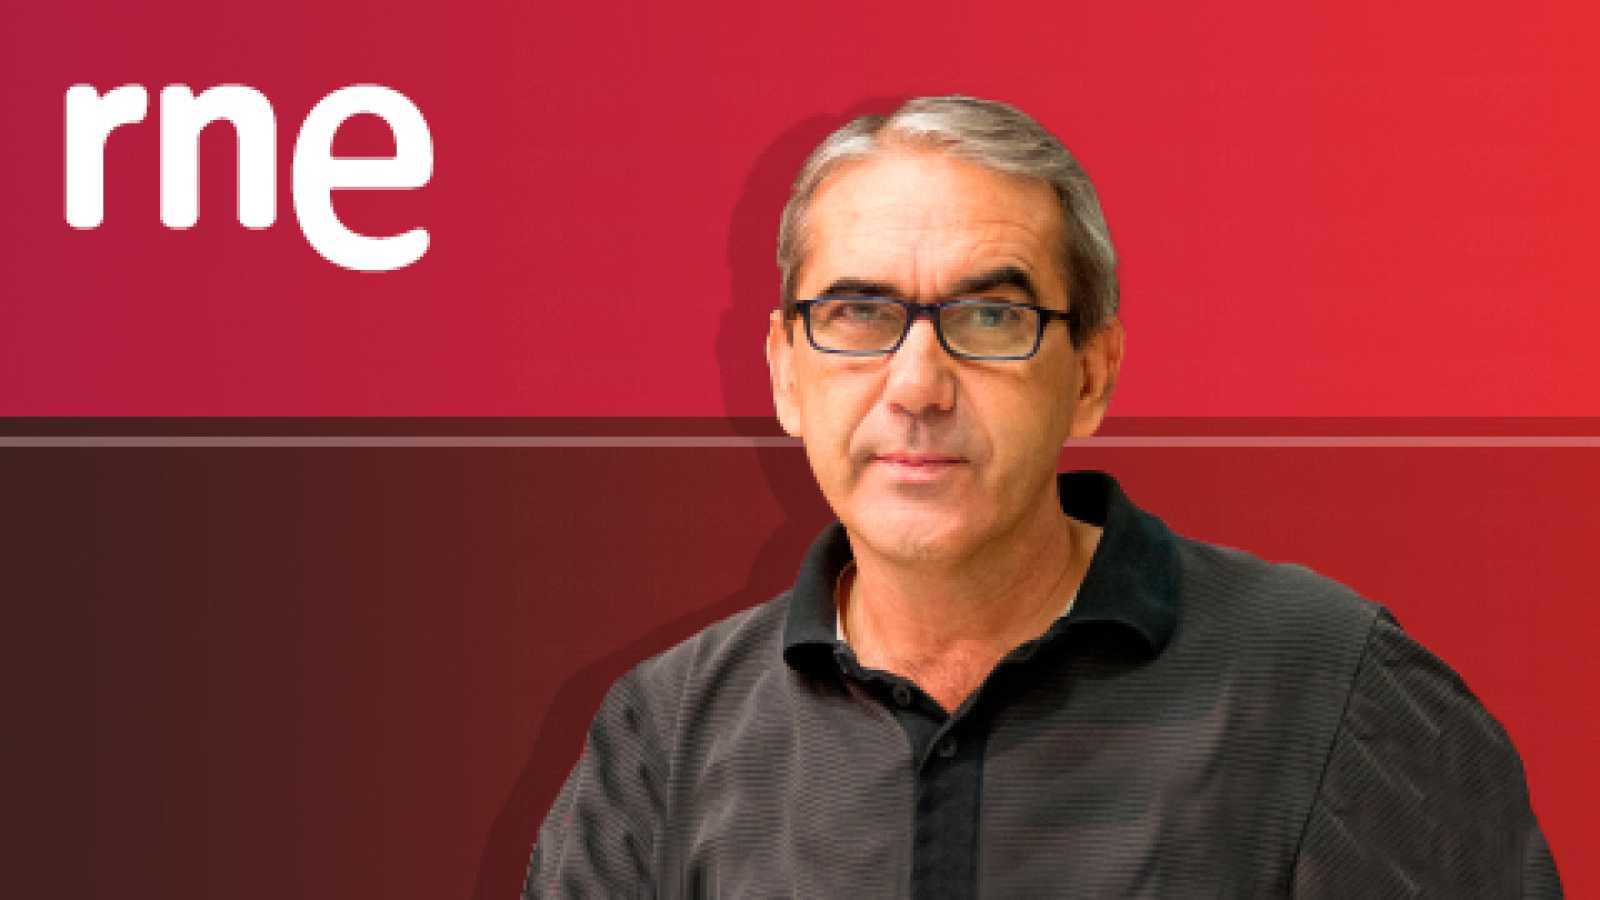 Jesús Carrasco - Llévame a casa - Historias de papel - Escuchar ahora